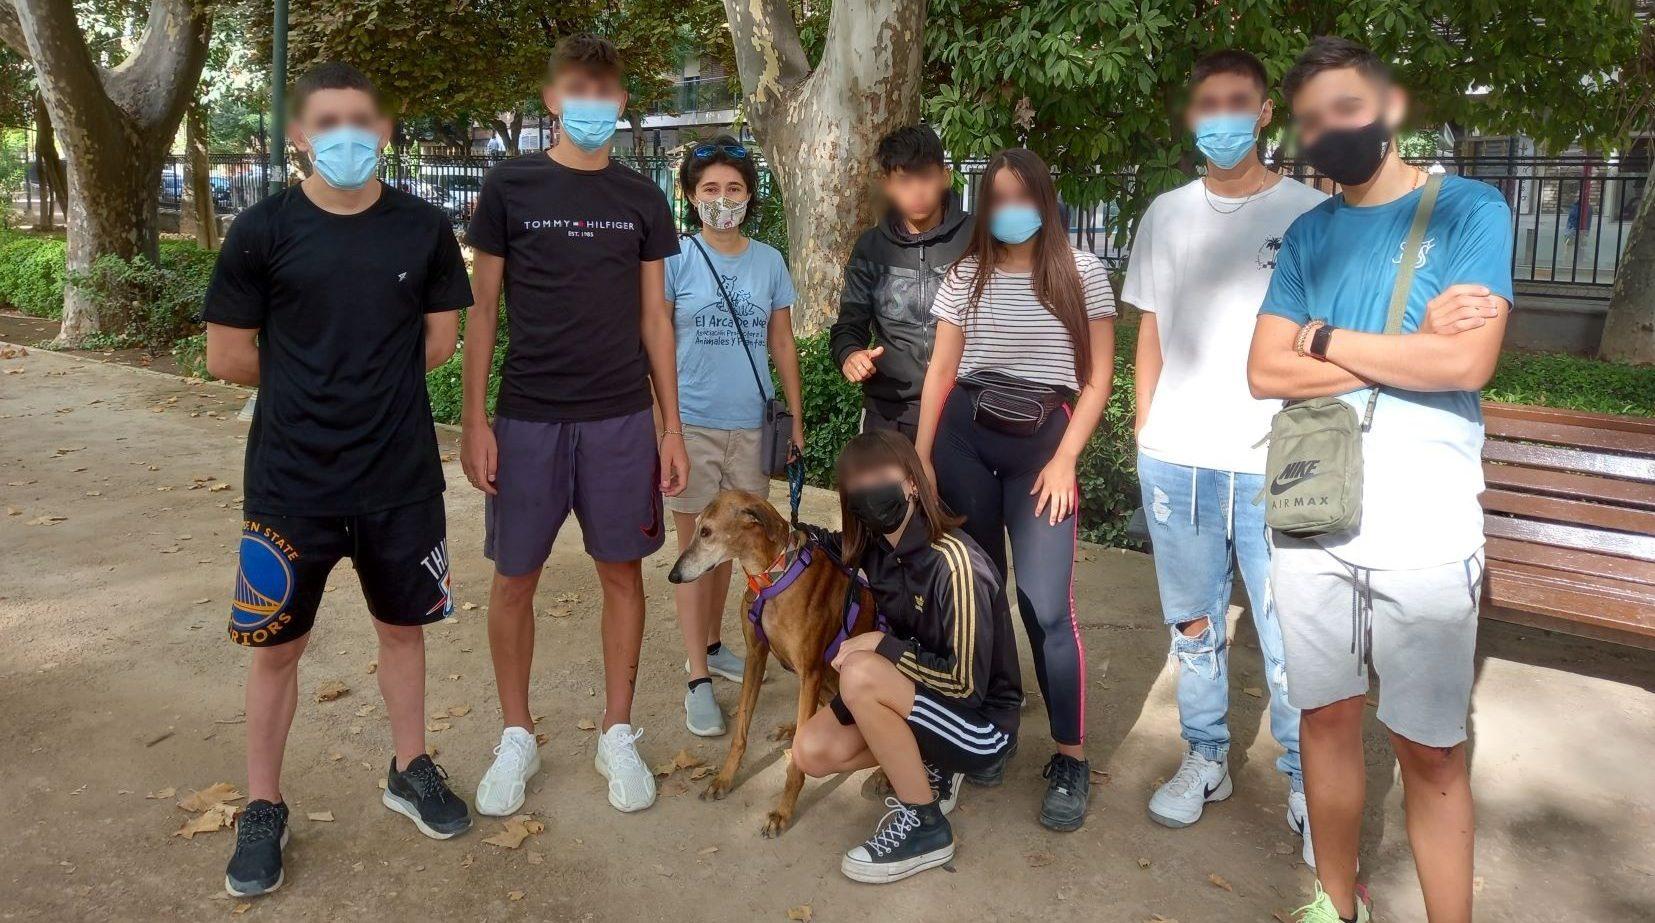 Yanis the galga visits a group of teenagers